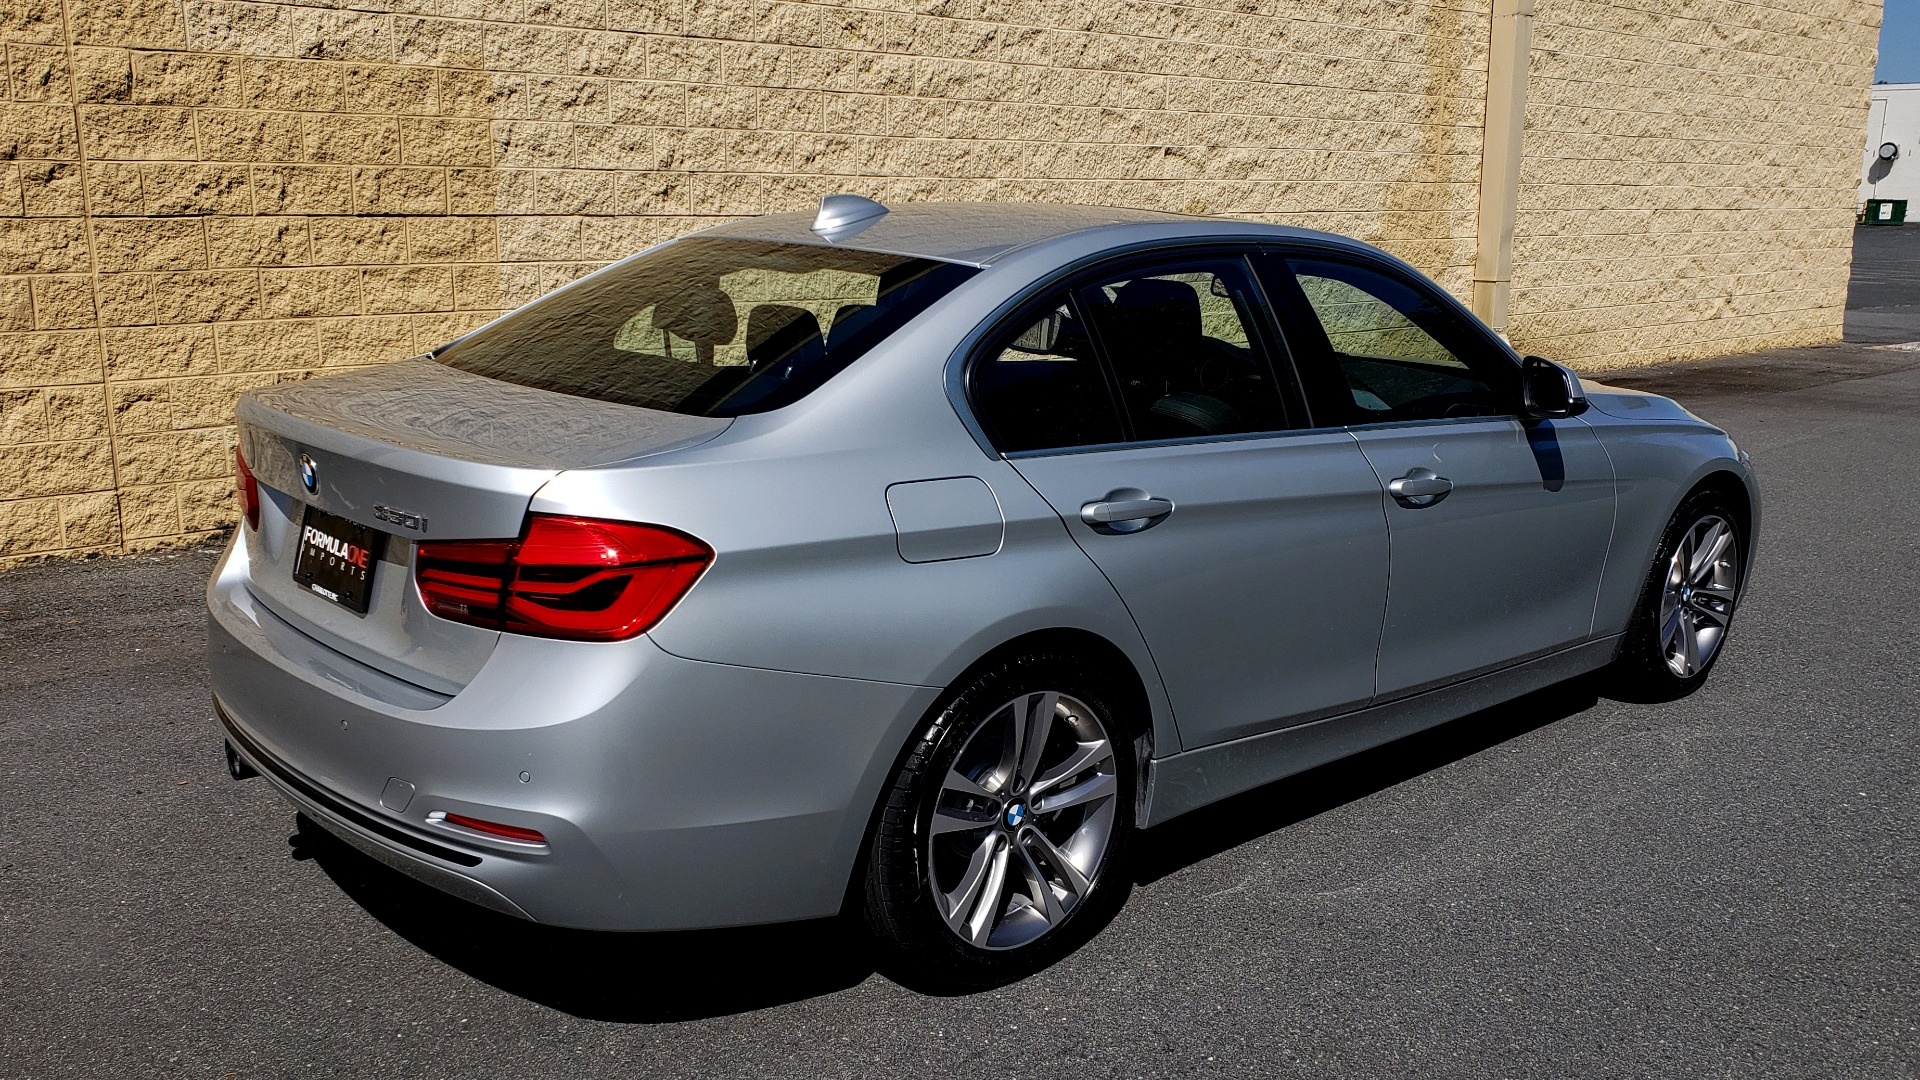 Used 2017 BMW 3 SERIES 330I SPORT SEDAN / DRVR ASST PKG / SUNROOF / REARVIEW for sale Sold at Formula Imports in Charlotte NC 28227 6